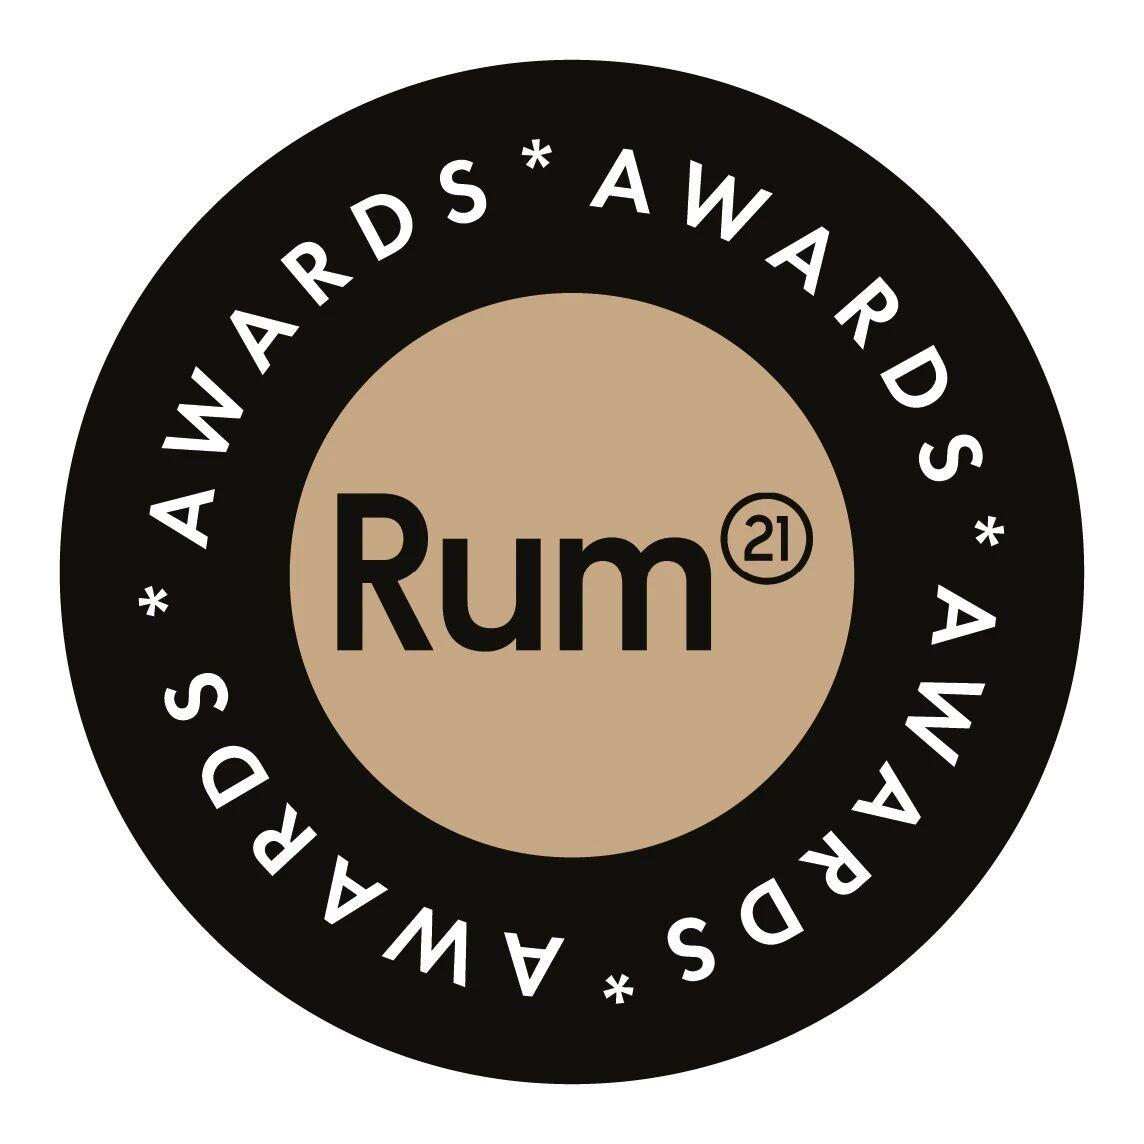 ed6899d3-9d8e-4688-80d9-ba9fa9443236_Rum21_awards_logga_1144x1144